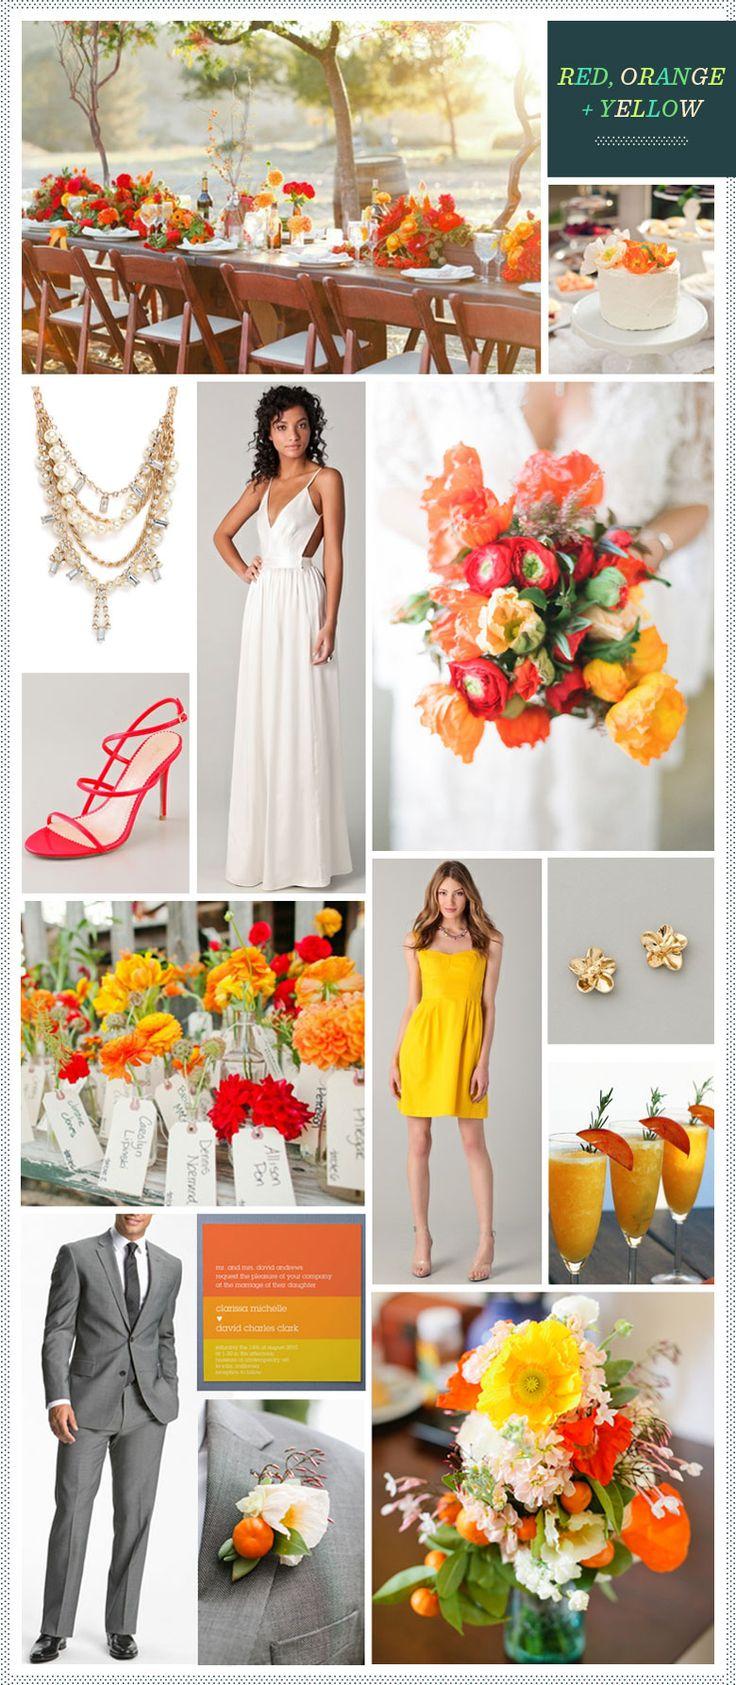 339 best images about ramadan decor on pinterest - Yellow and orange wedding decorations ...